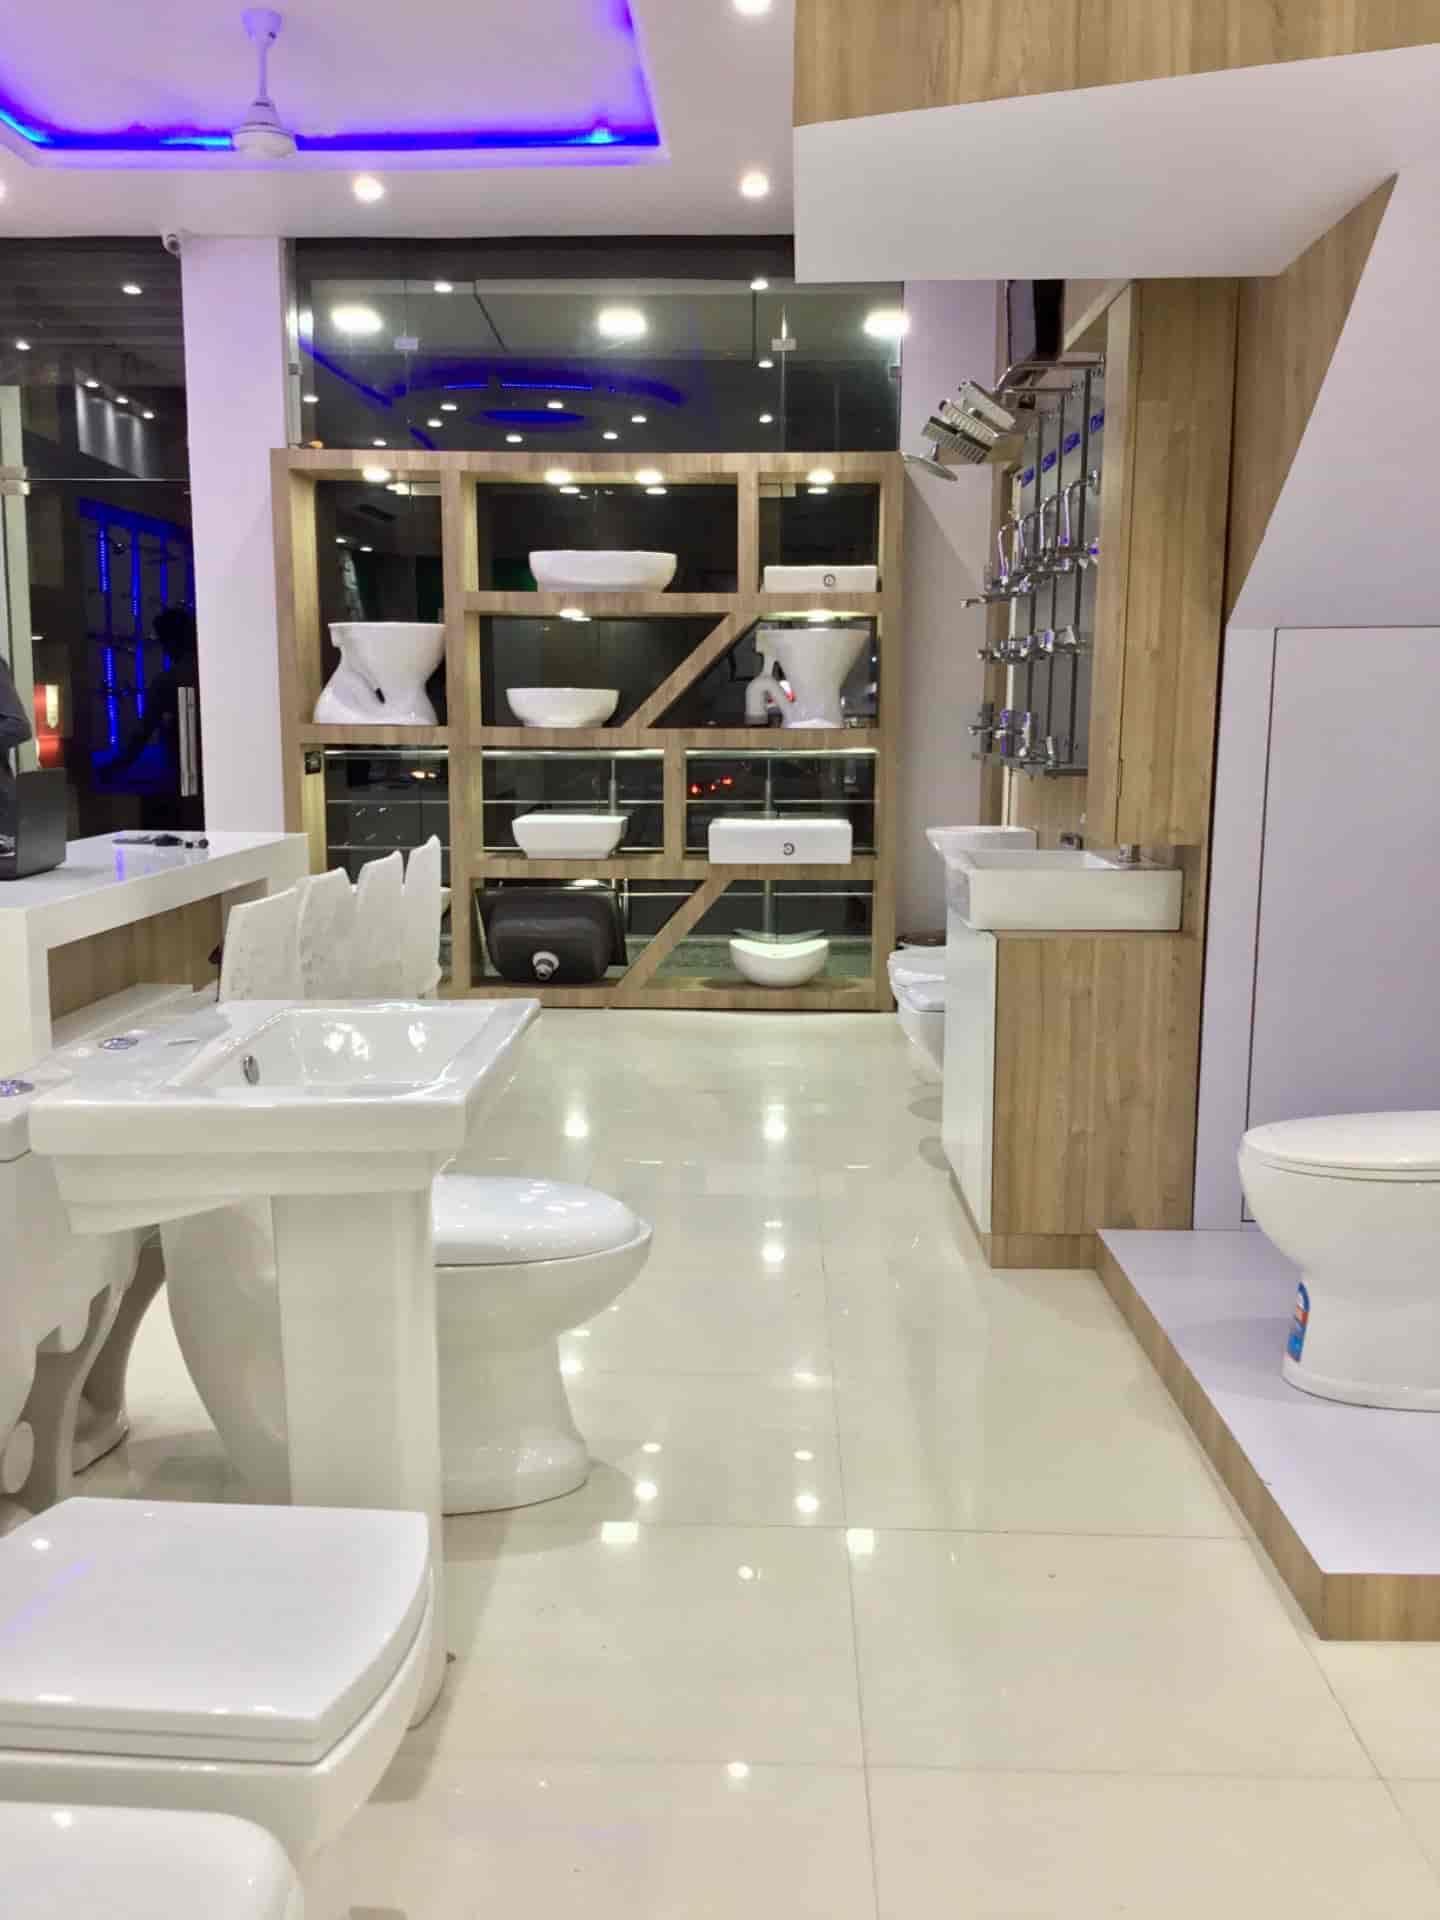 s-r-enterprises-pilibhit-bypass-bareilly-marble-dealers-brzybmvxum.jpg (1024×370)